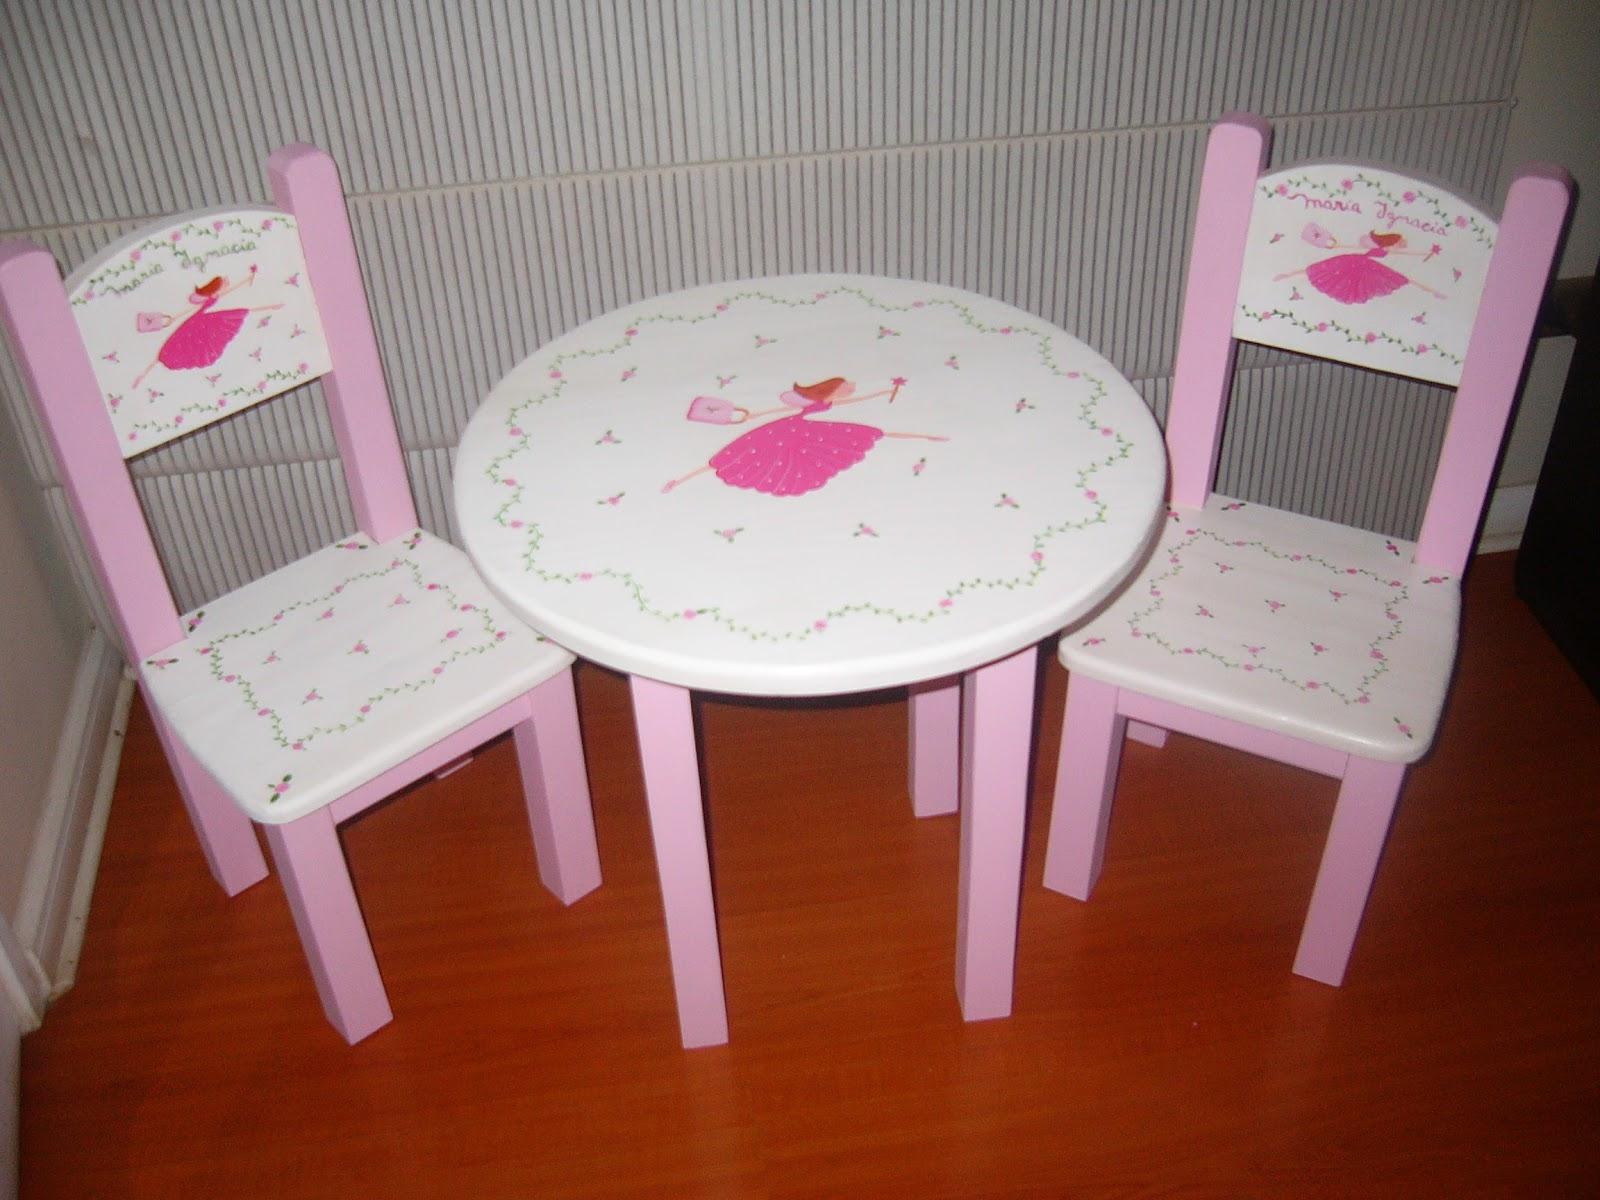 Muebles infantiles decoraci n para ni os juguetes for Mesa y silla infantil